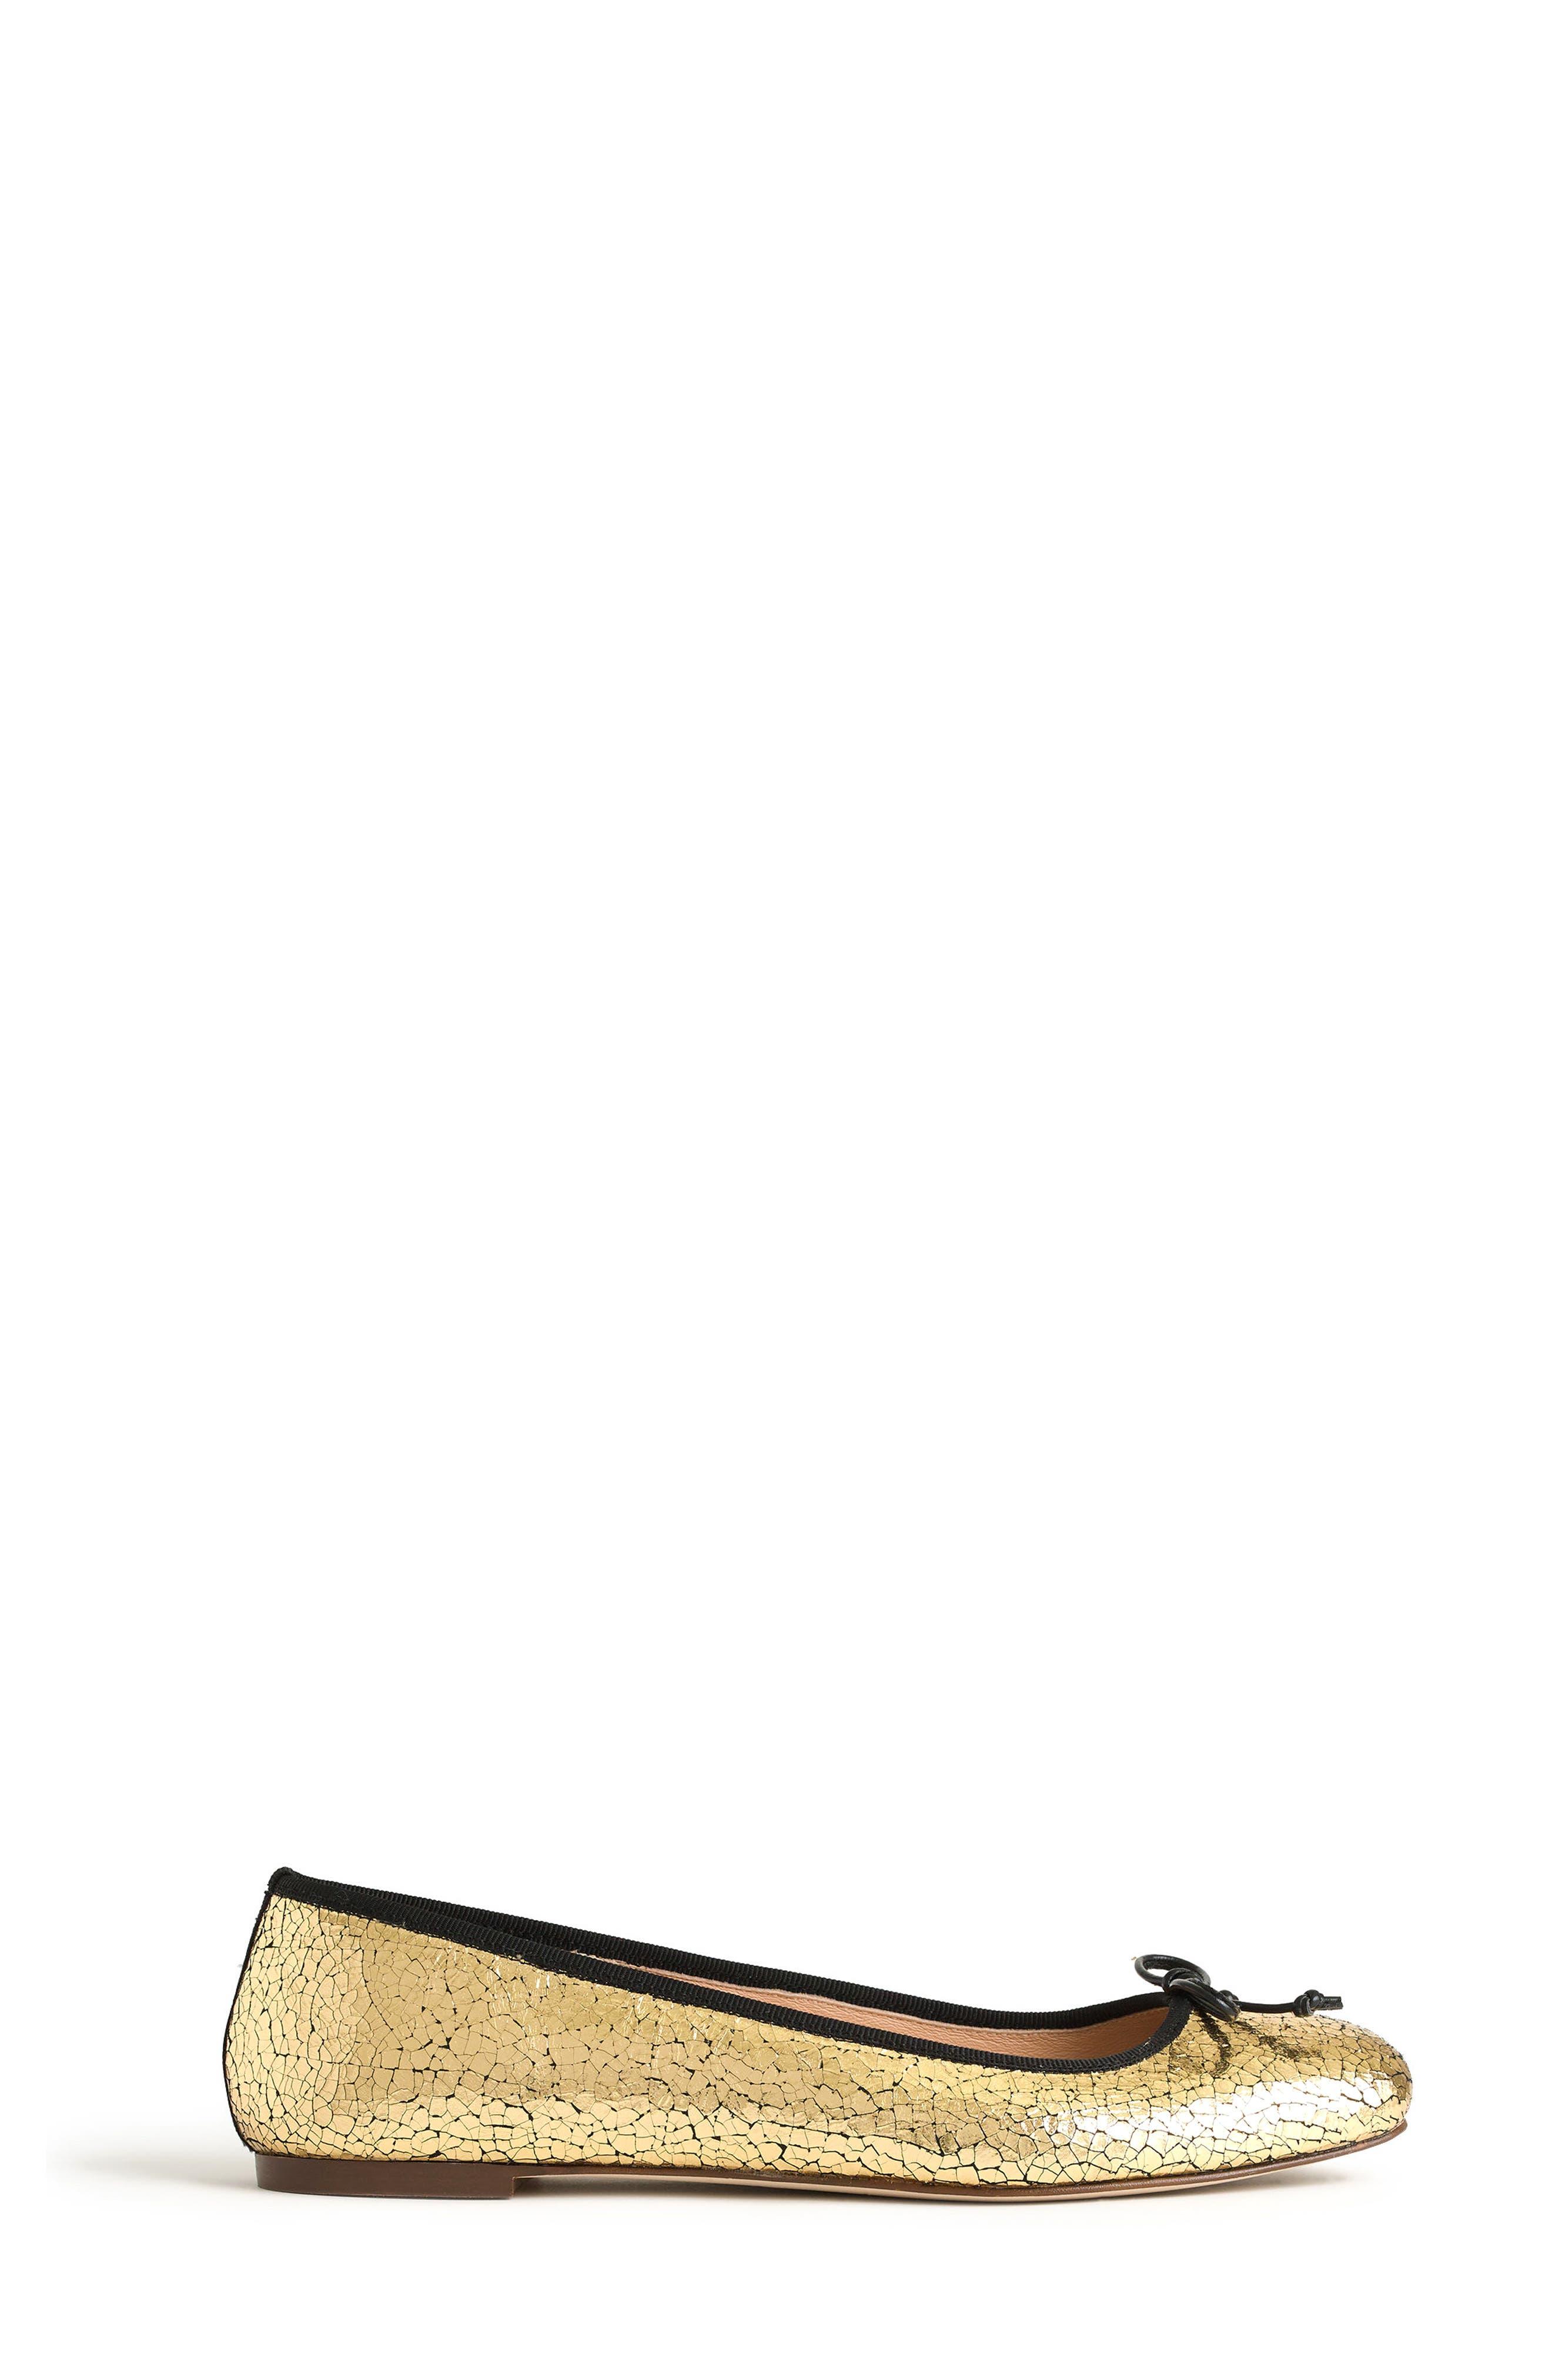 J. Crew Franklin Crackle Flat,                             Alternate thumbnail 2, color,                             Gold/ Black Fabric